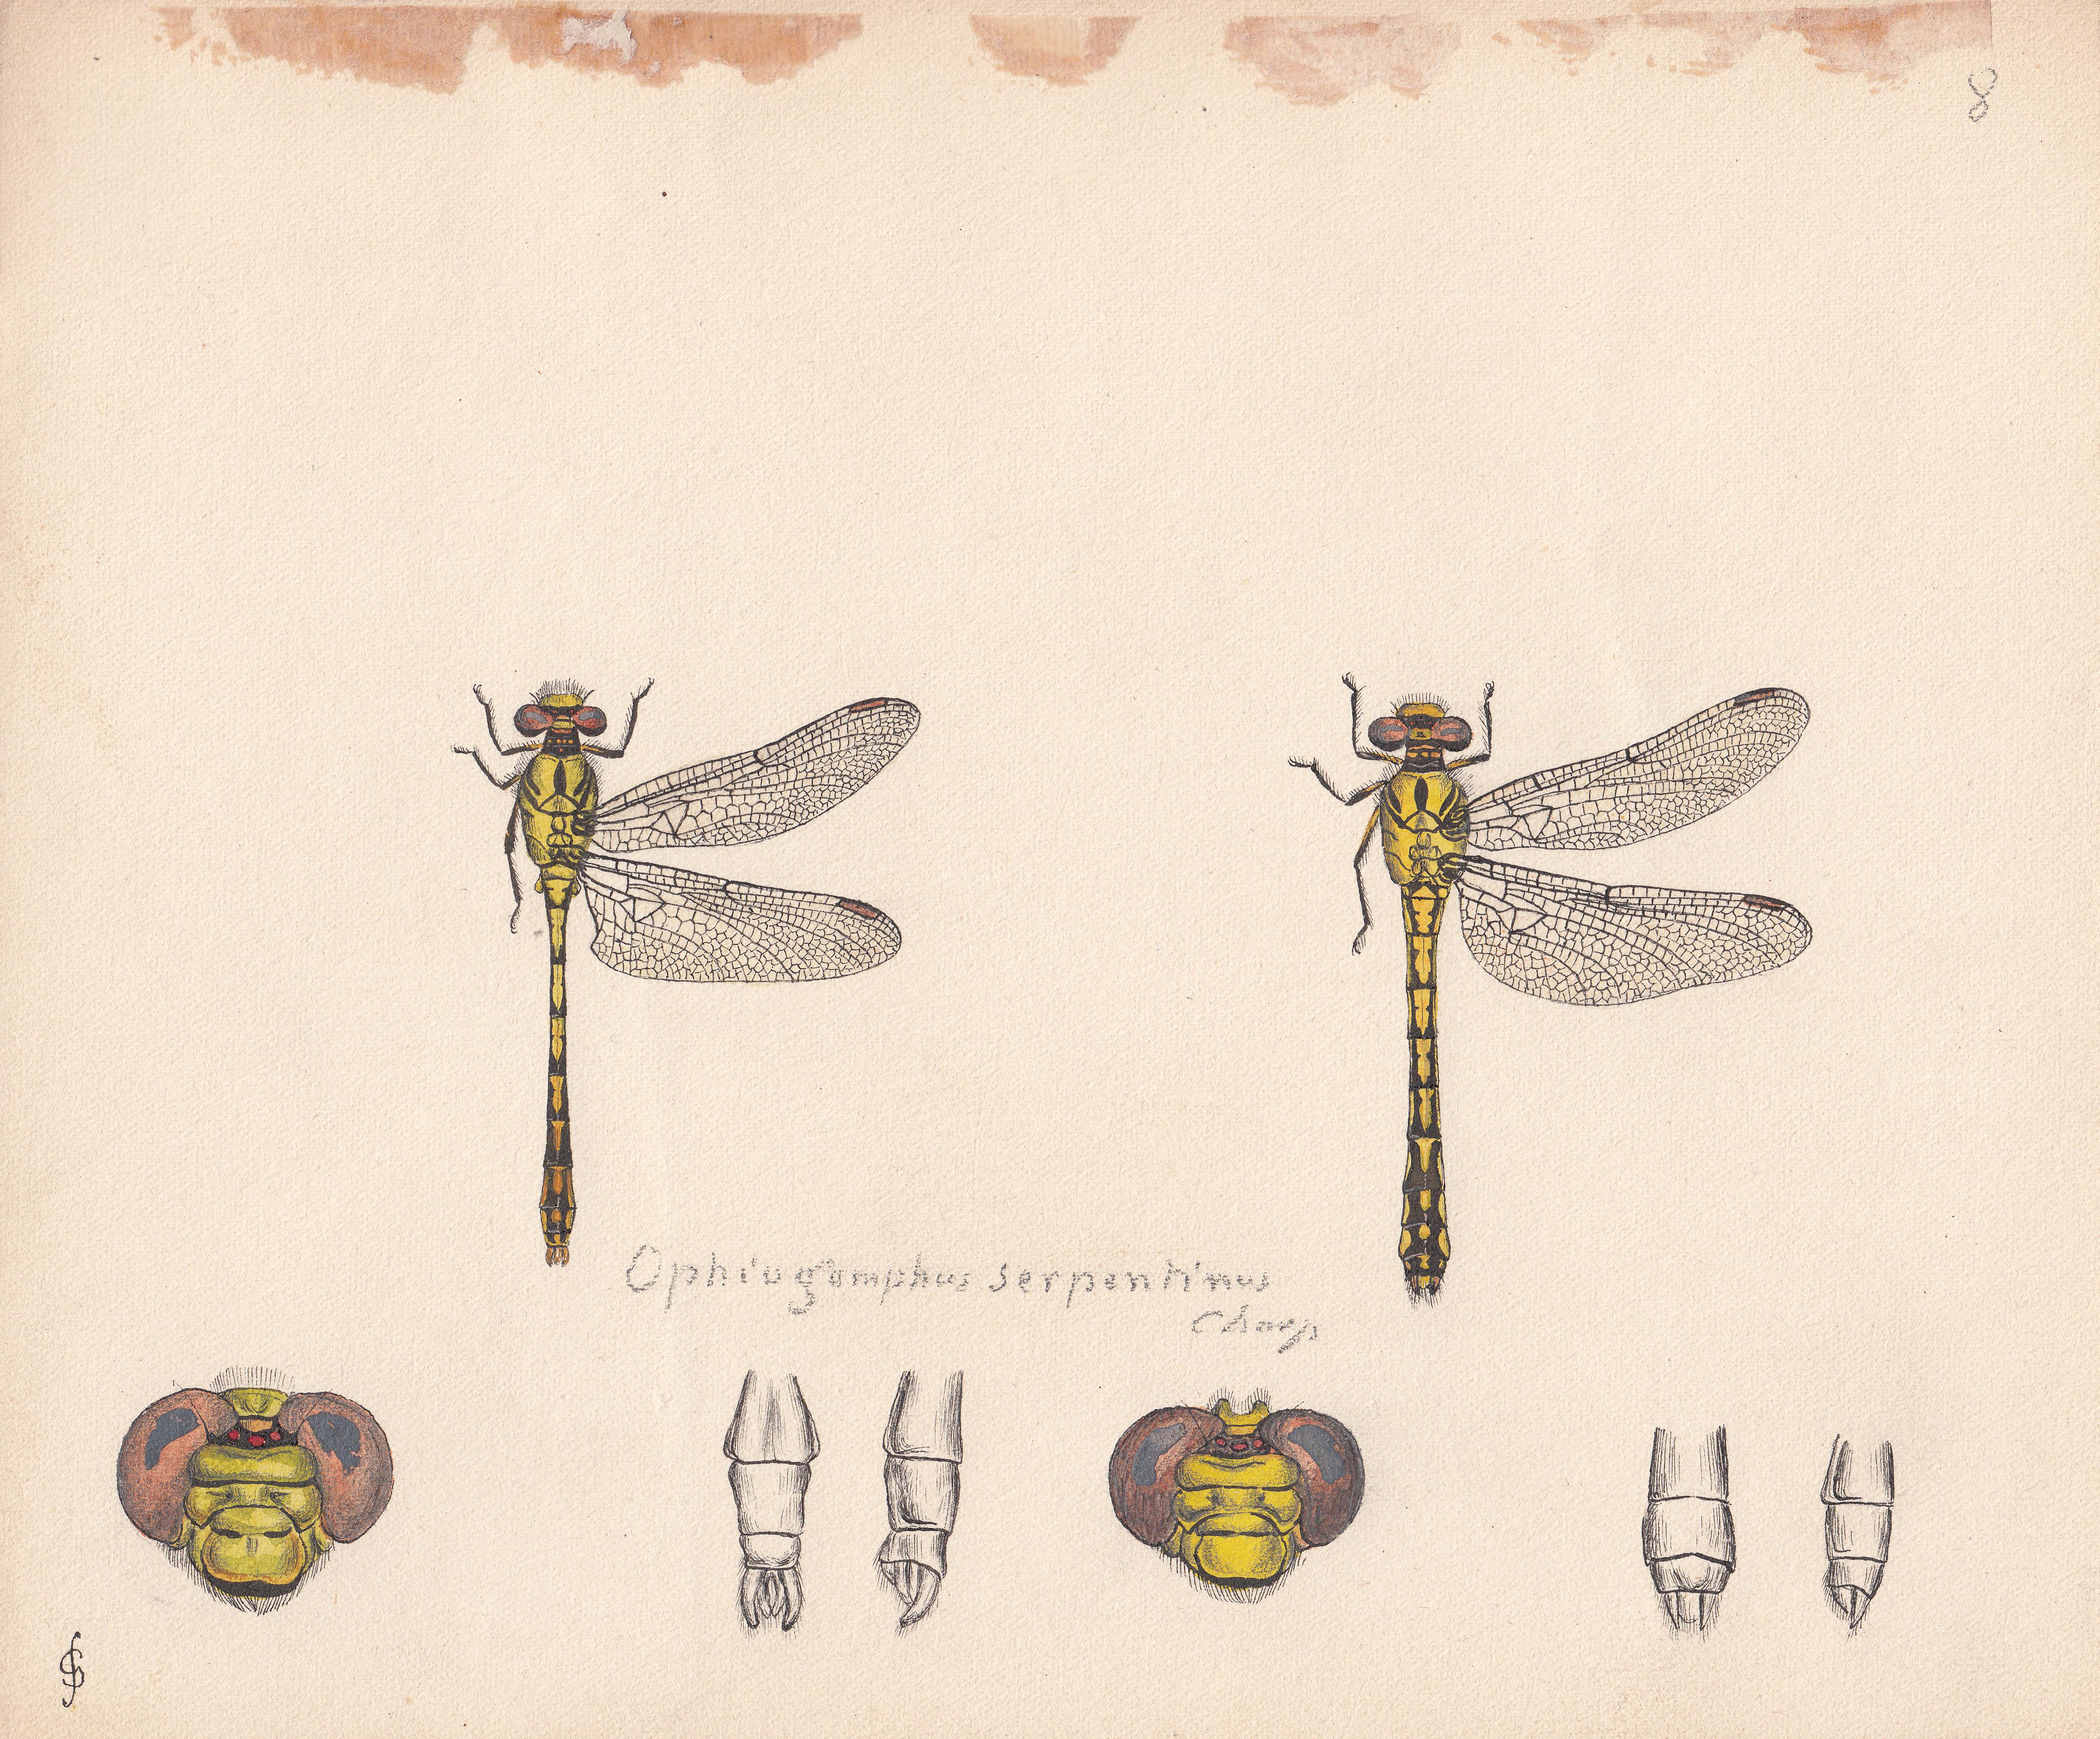 Ophiogomphus serpentinus.jpg